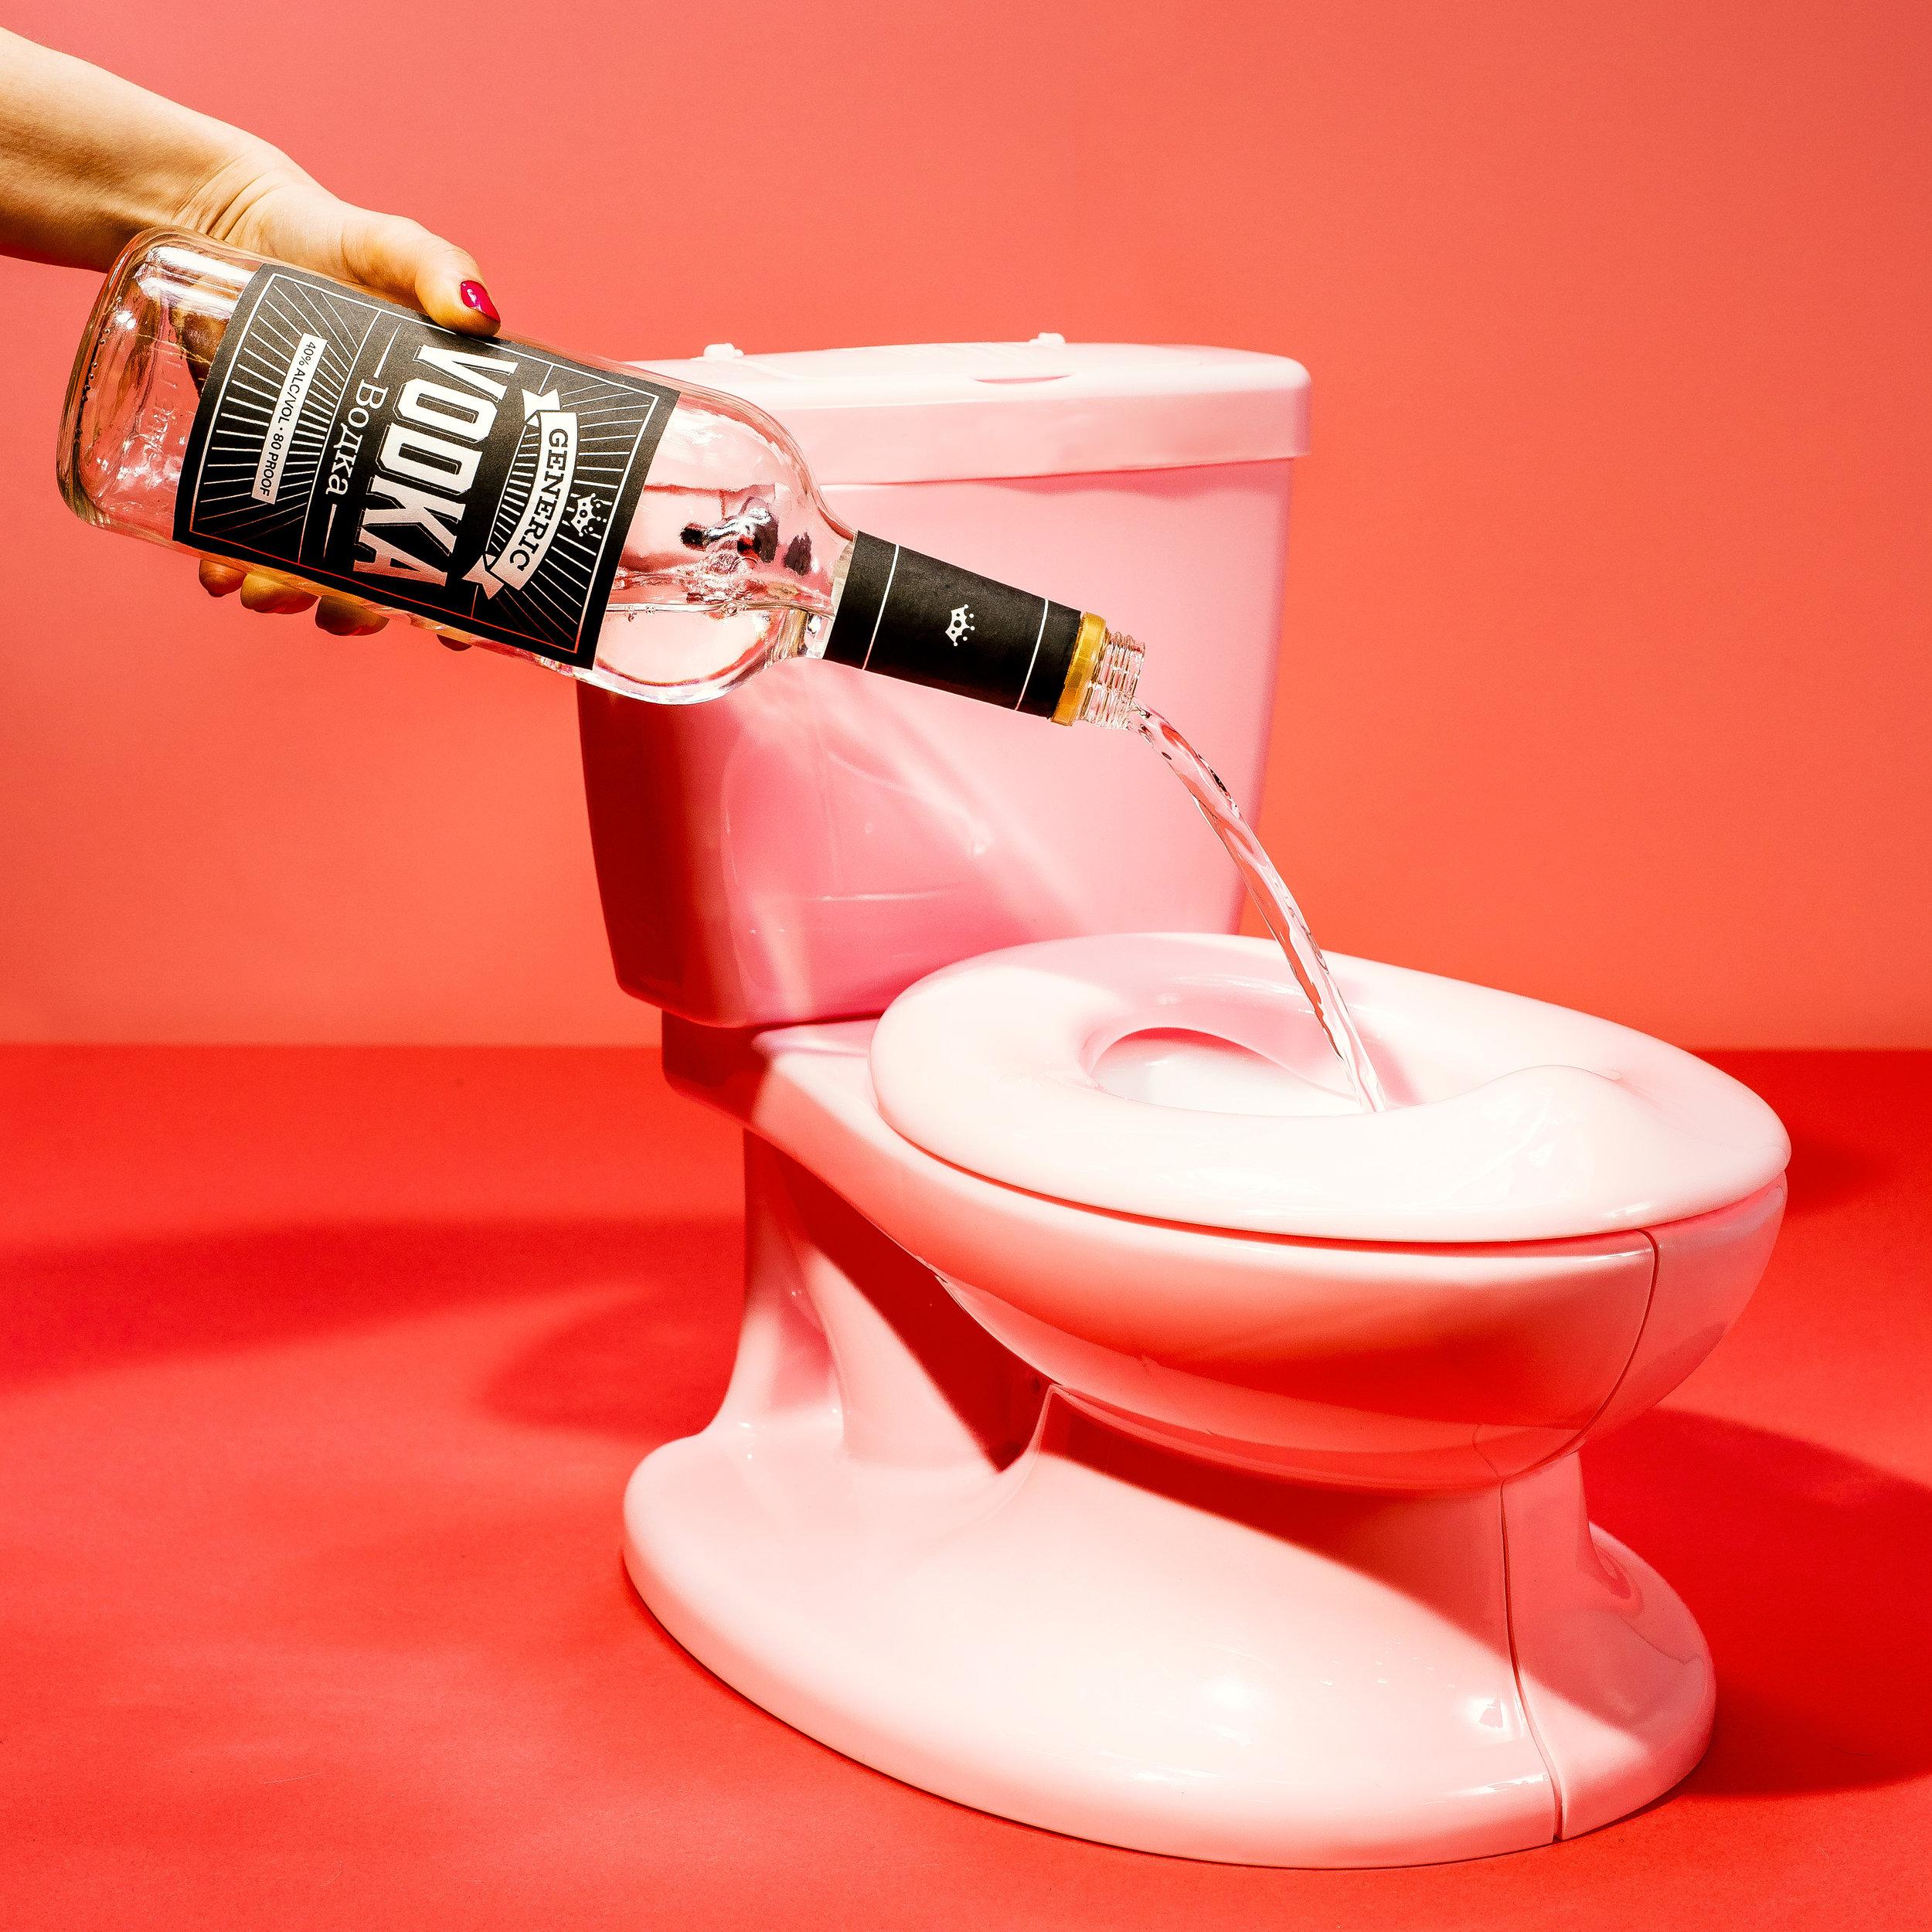 toiletSquare.jpg